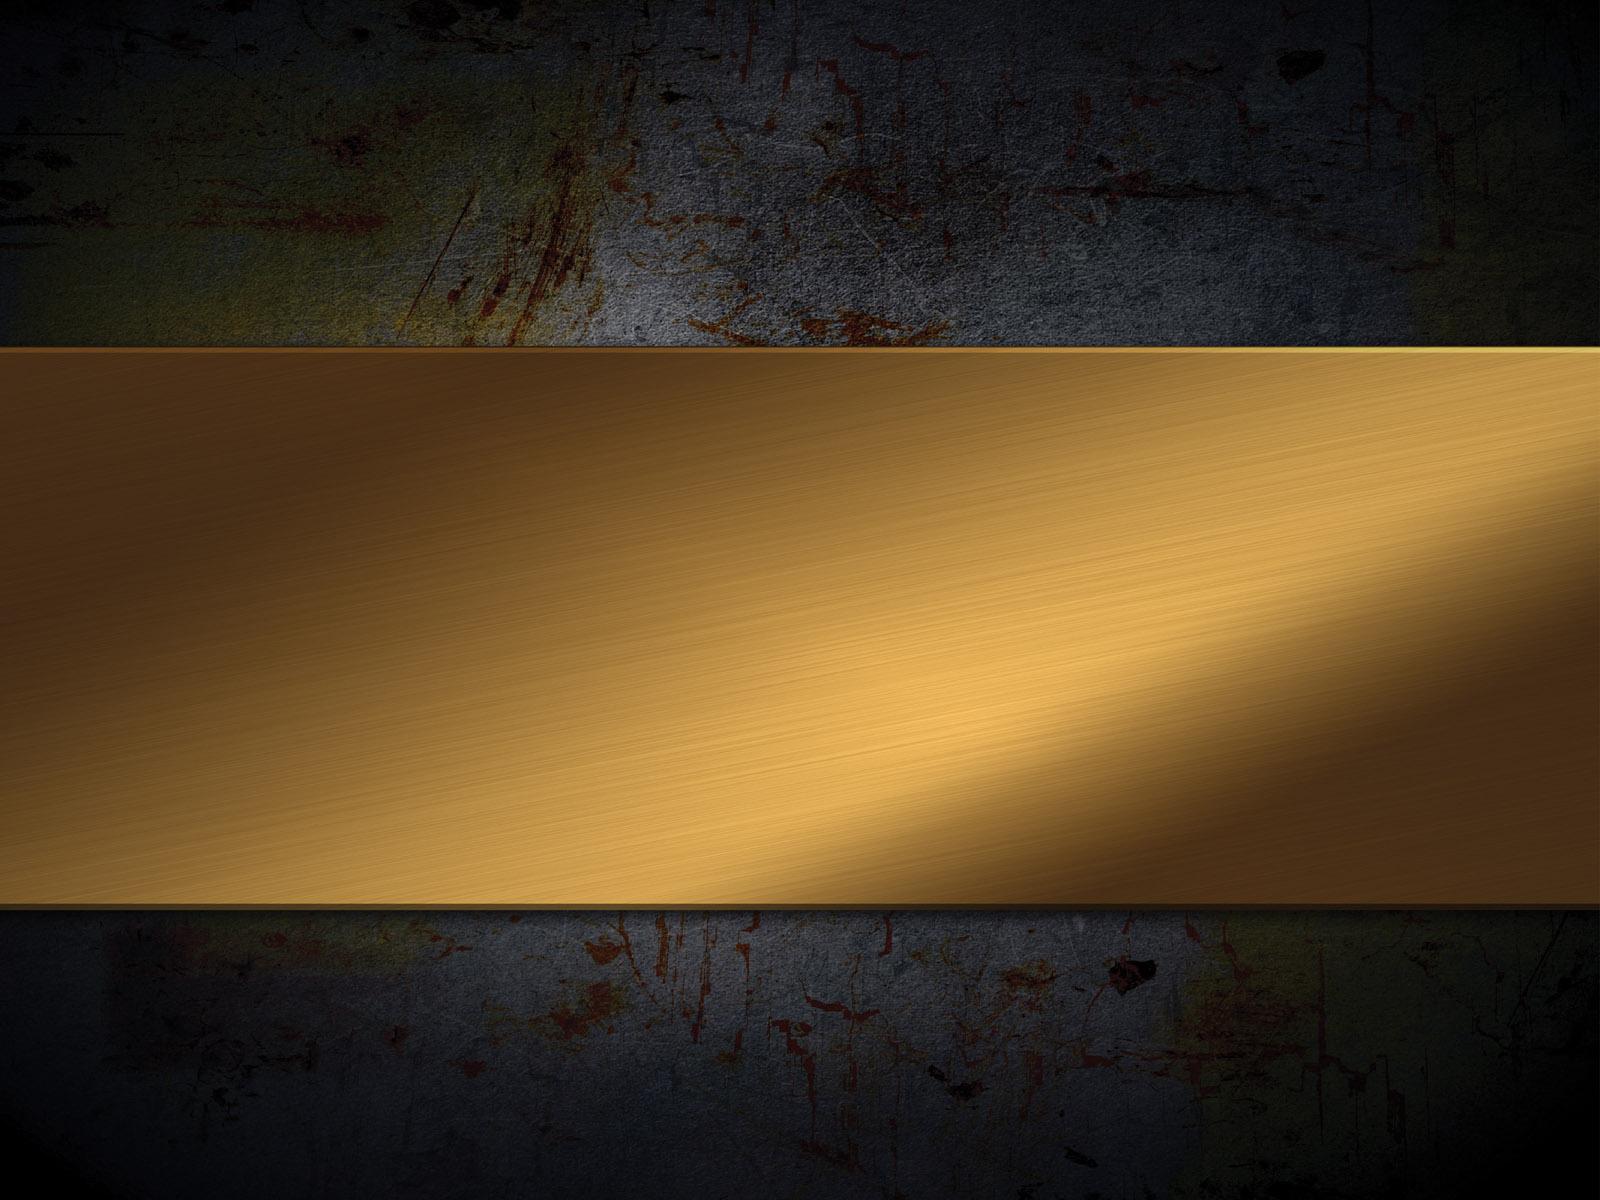 Black And Gold Background 4 High Resolution Wallpaper. Footprints Help Desk. Alto Shaam Drawer Warmer. Uga Help Desk. Antique Postmaster Desk. Buy An Office Desk. Colorful Kitchen Table. Computer Desk Minimalist. Round Wooden Kitchen Table